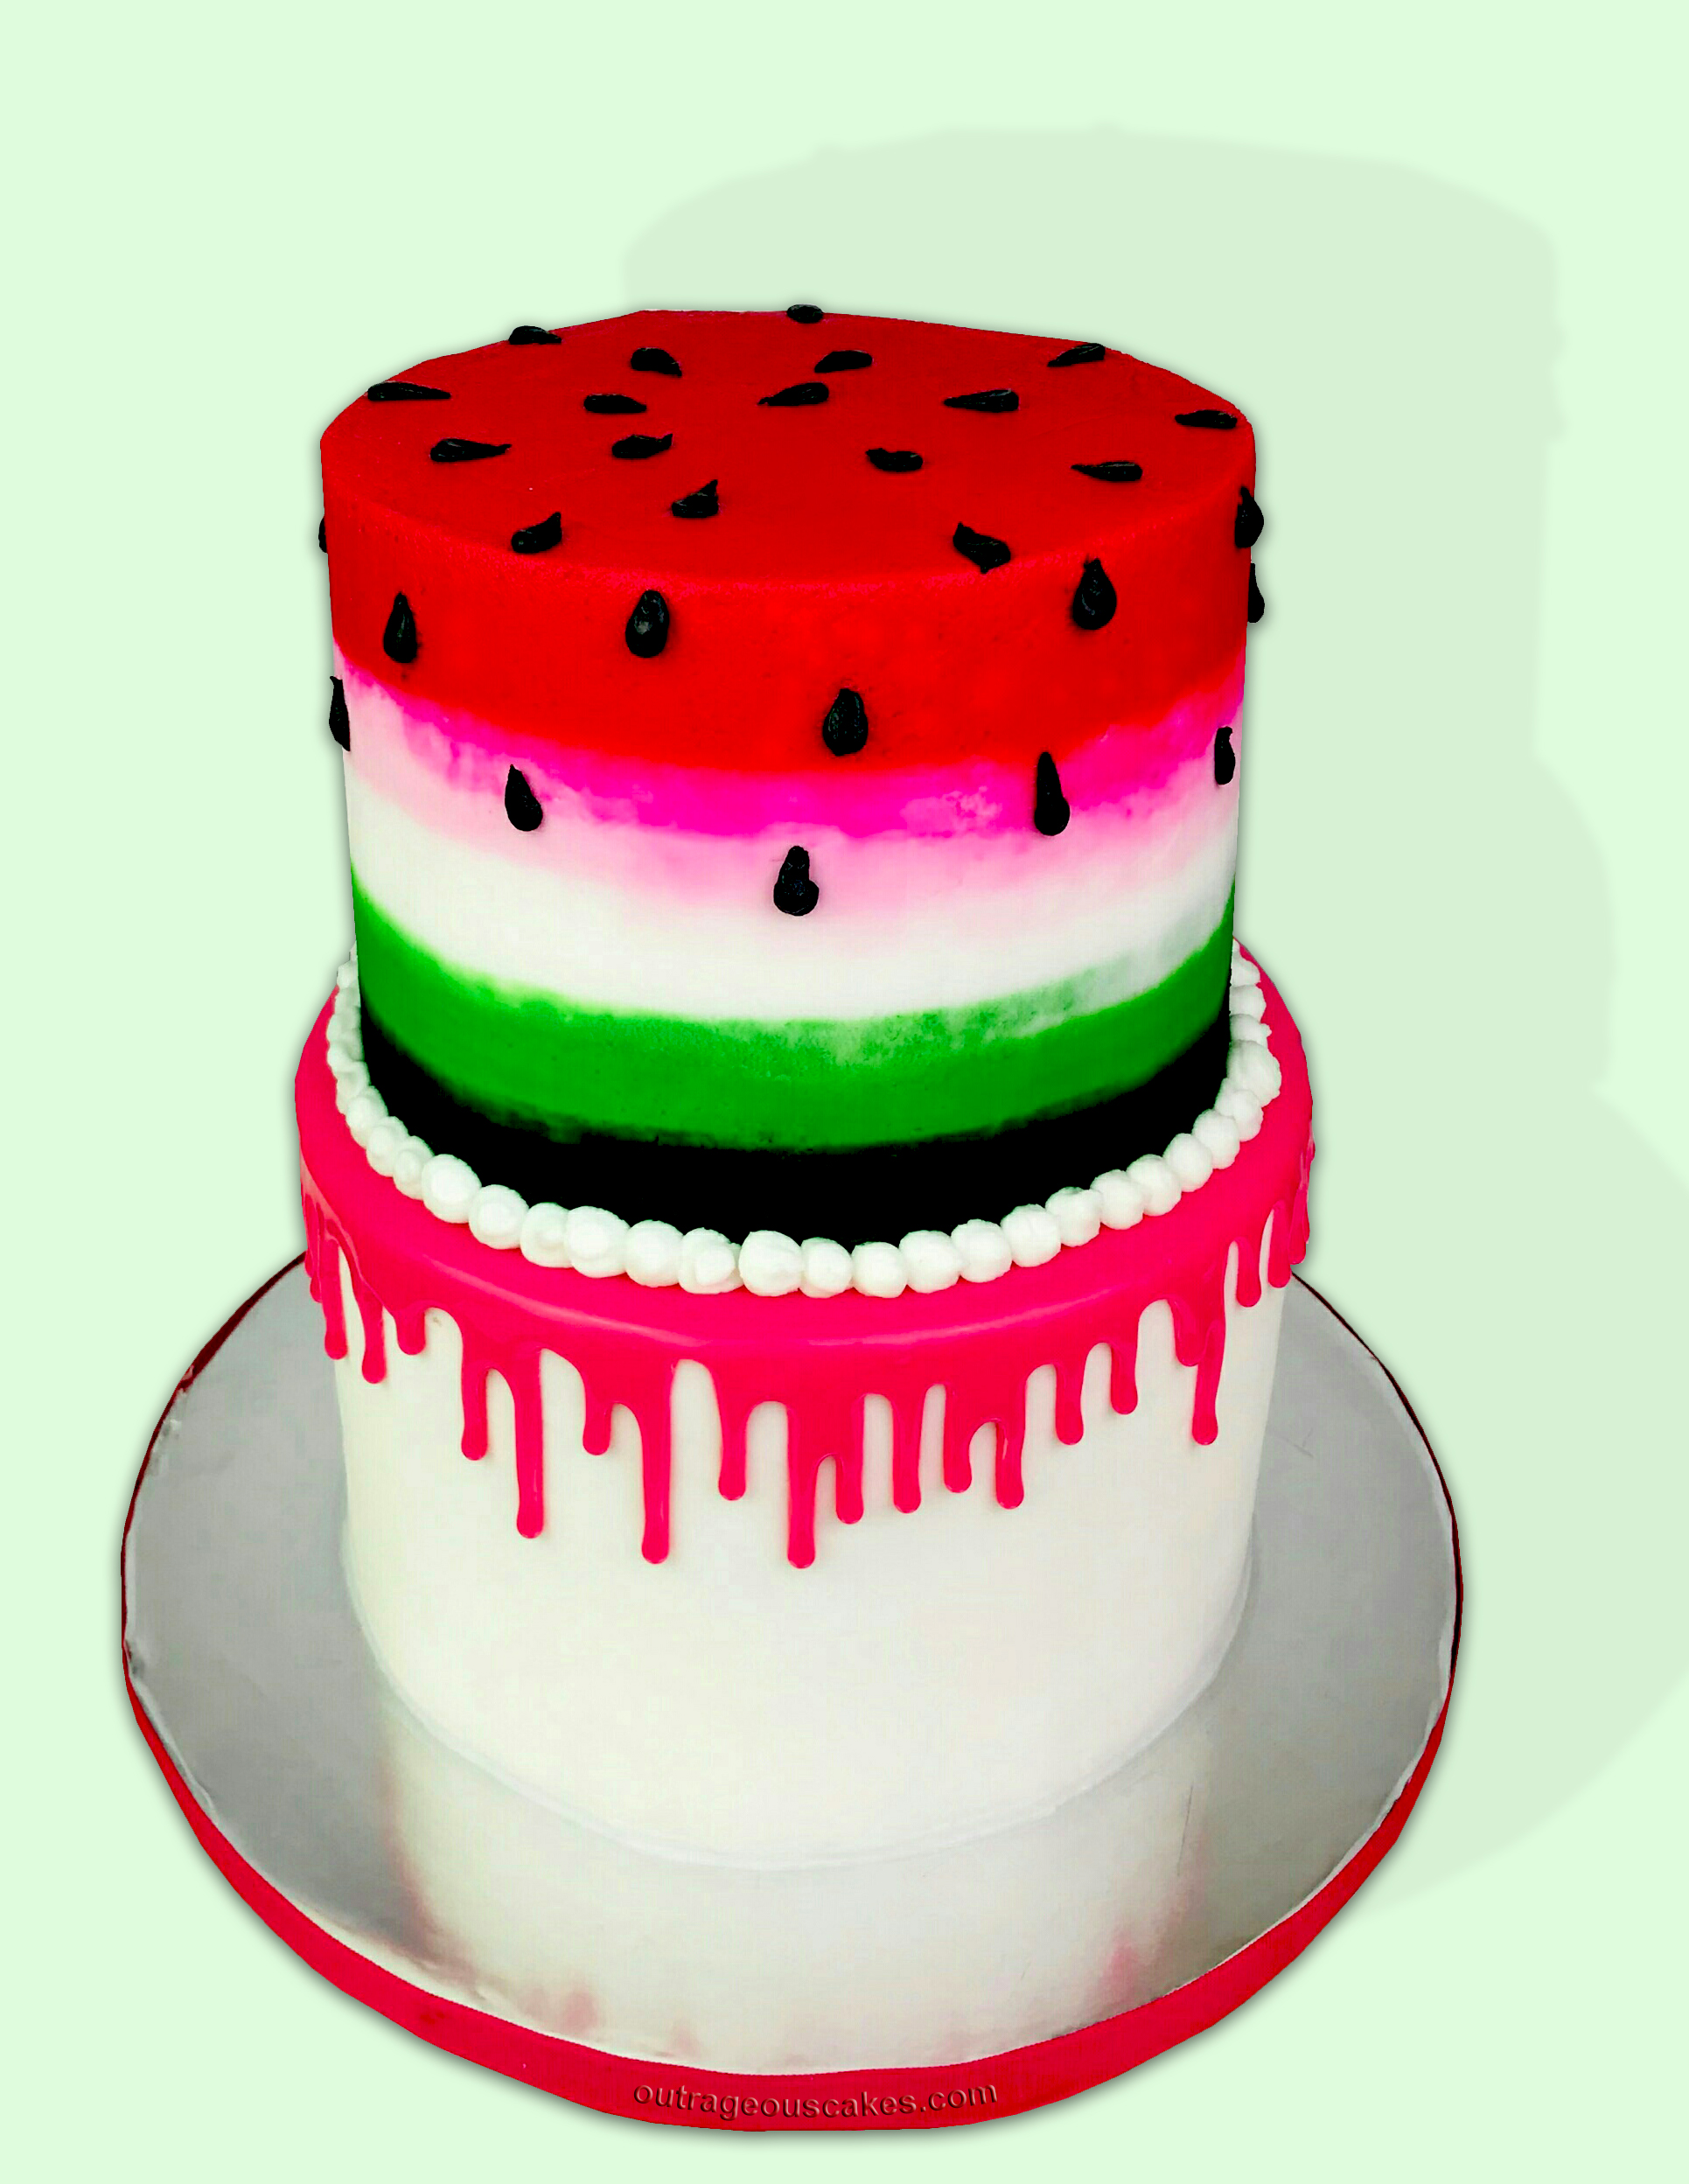 Watermelon Drip Cake